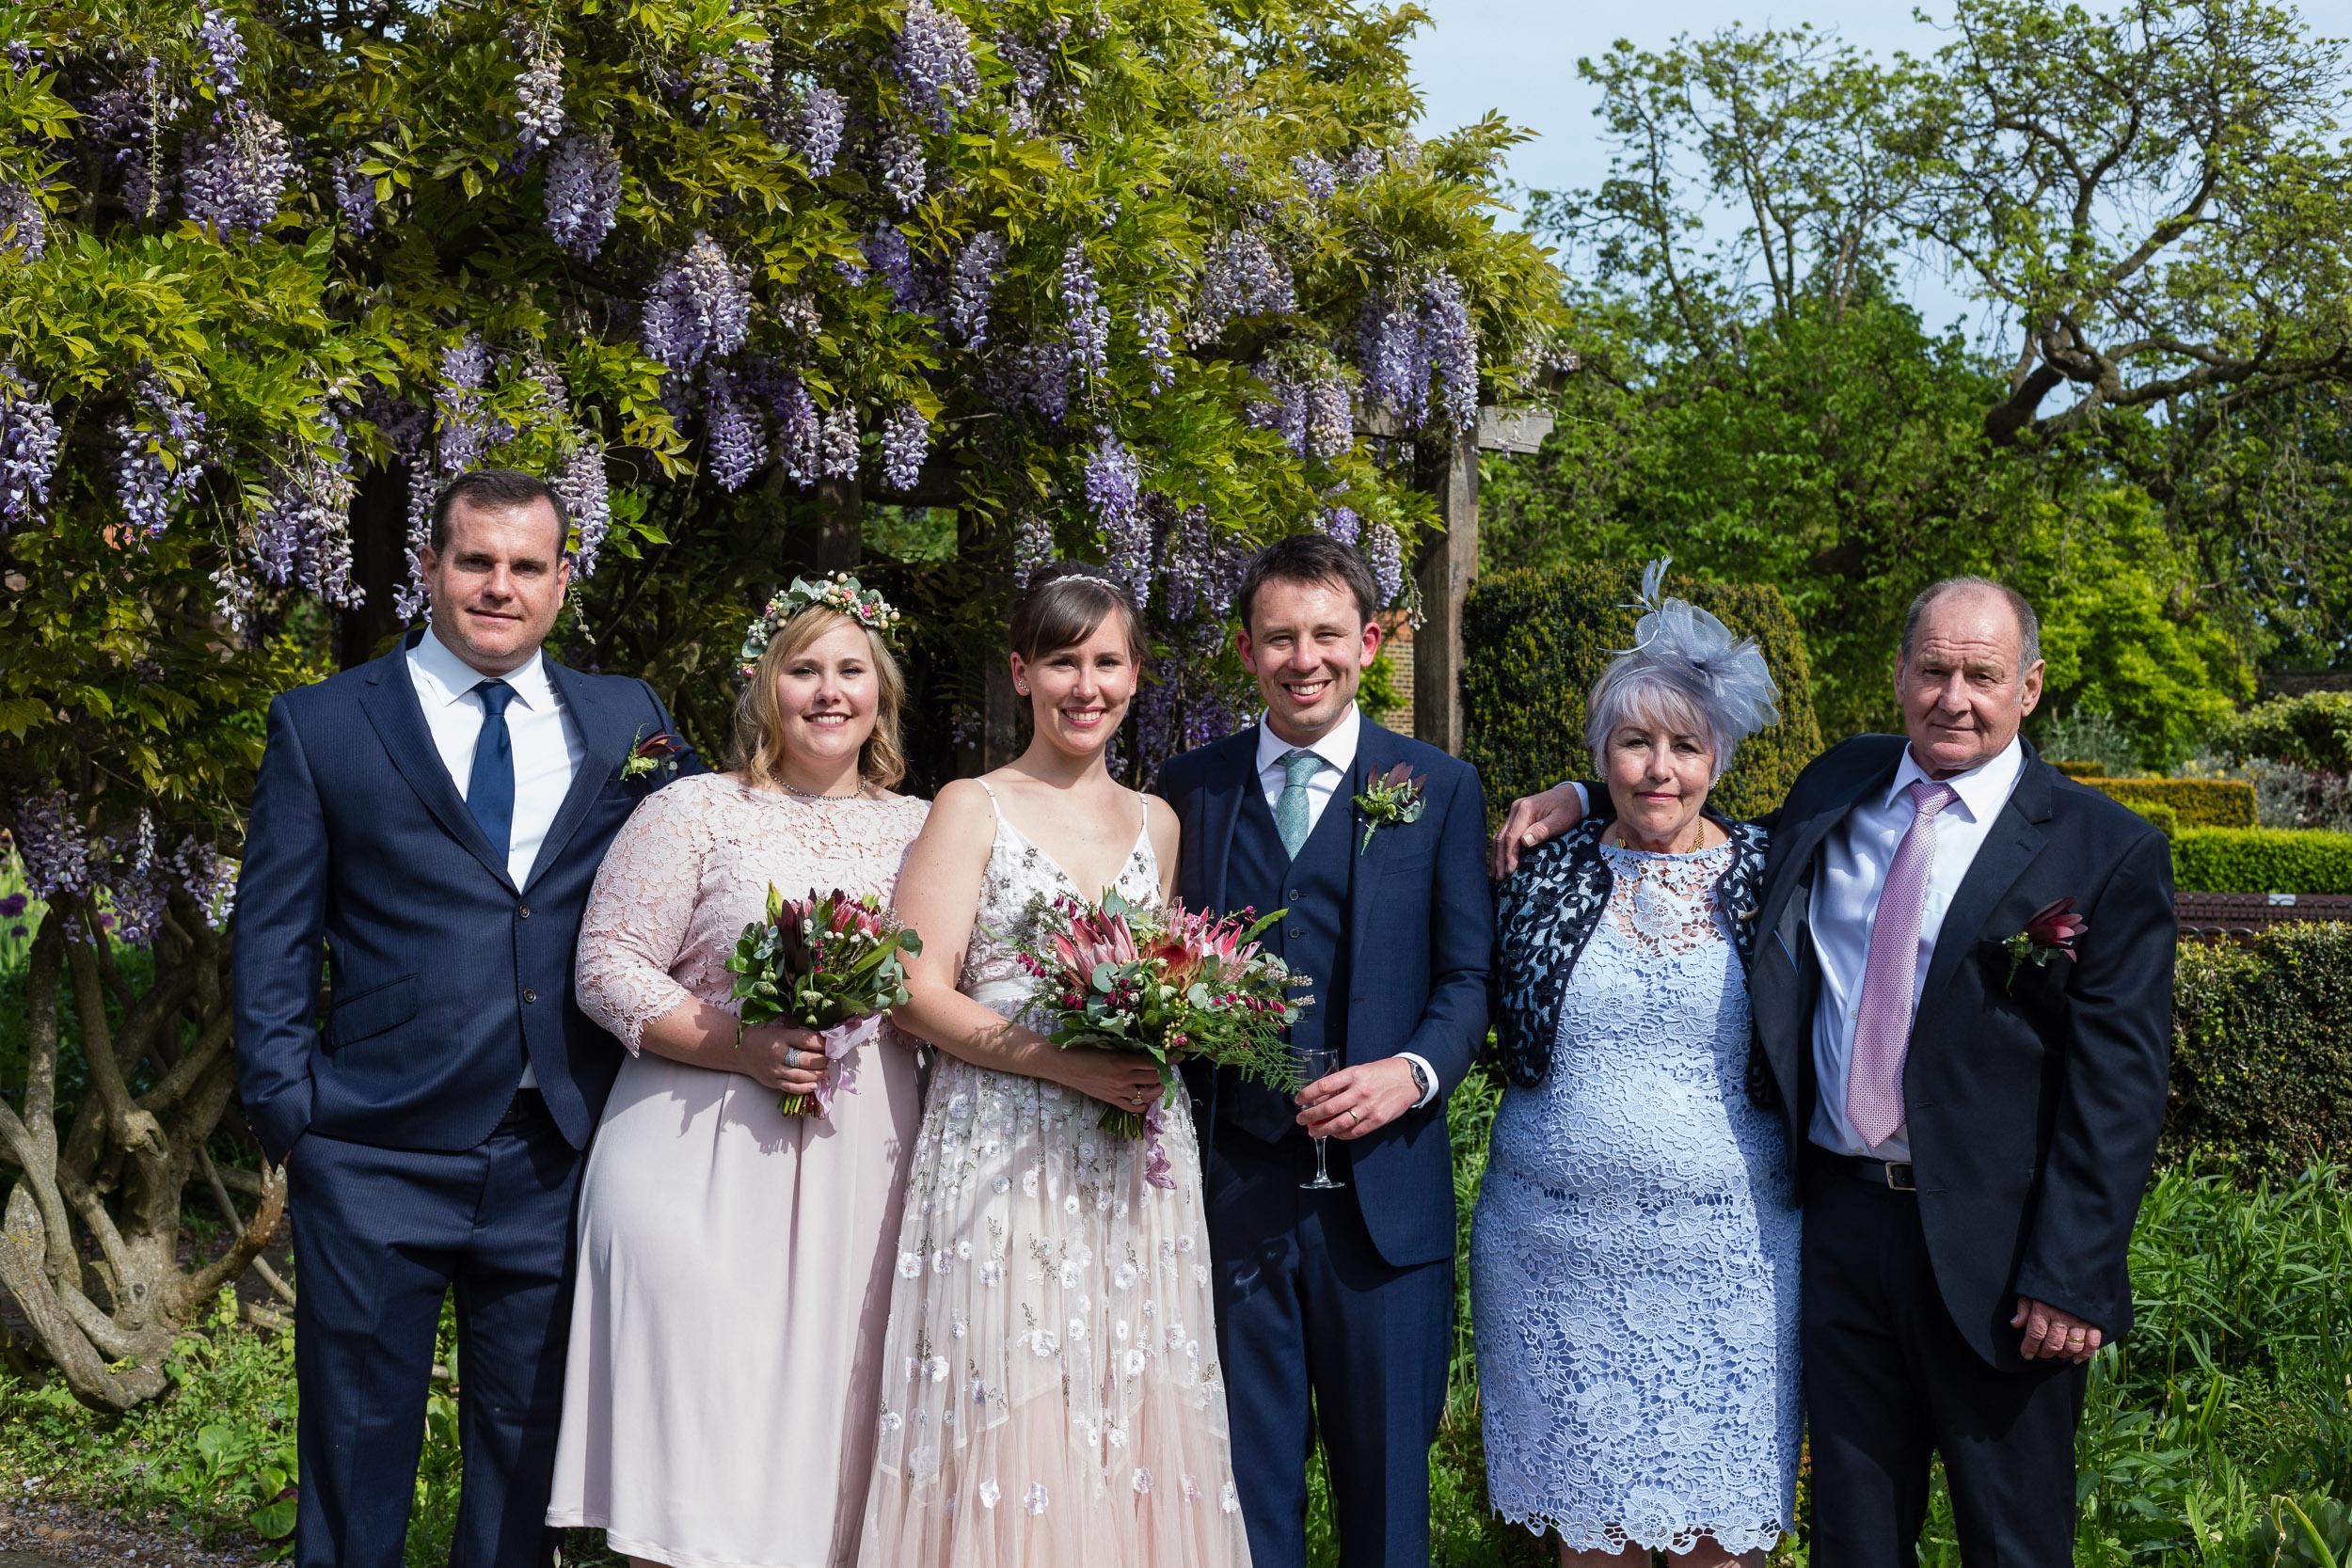 brockwell-lido-brixton-herne-hill-wedding-260.jpg